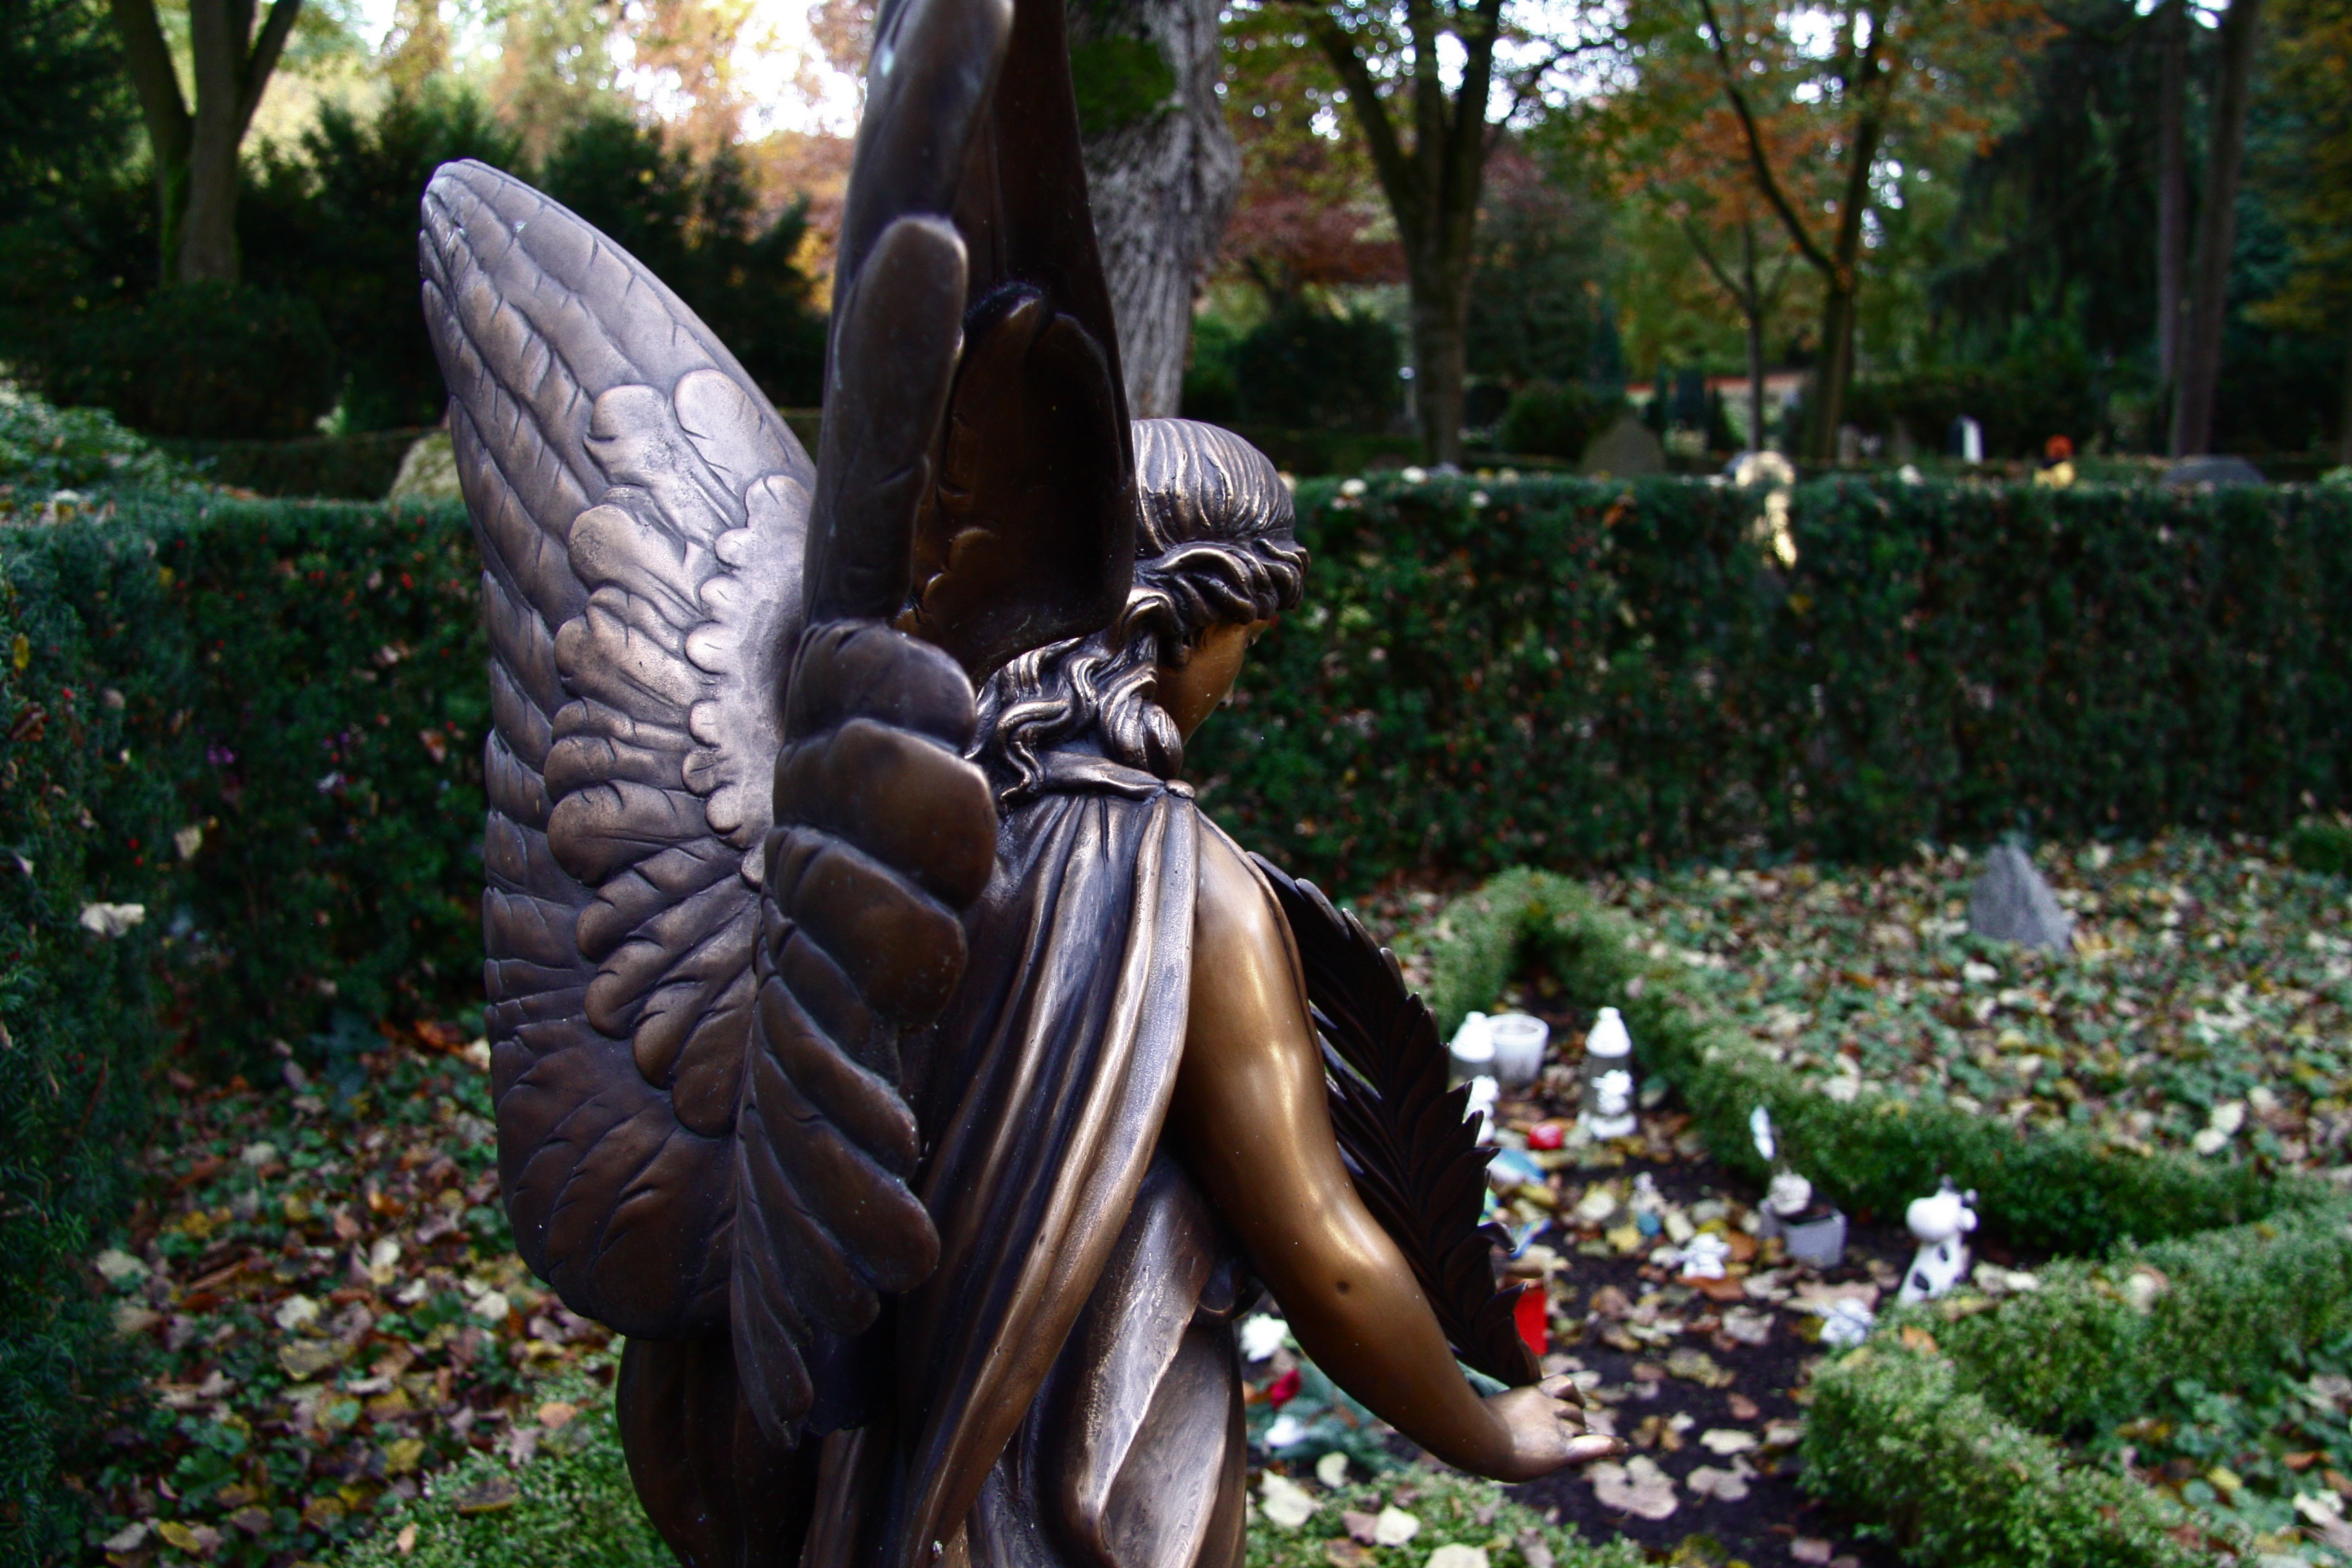 1_Engel mit Sternenfeld - farbig